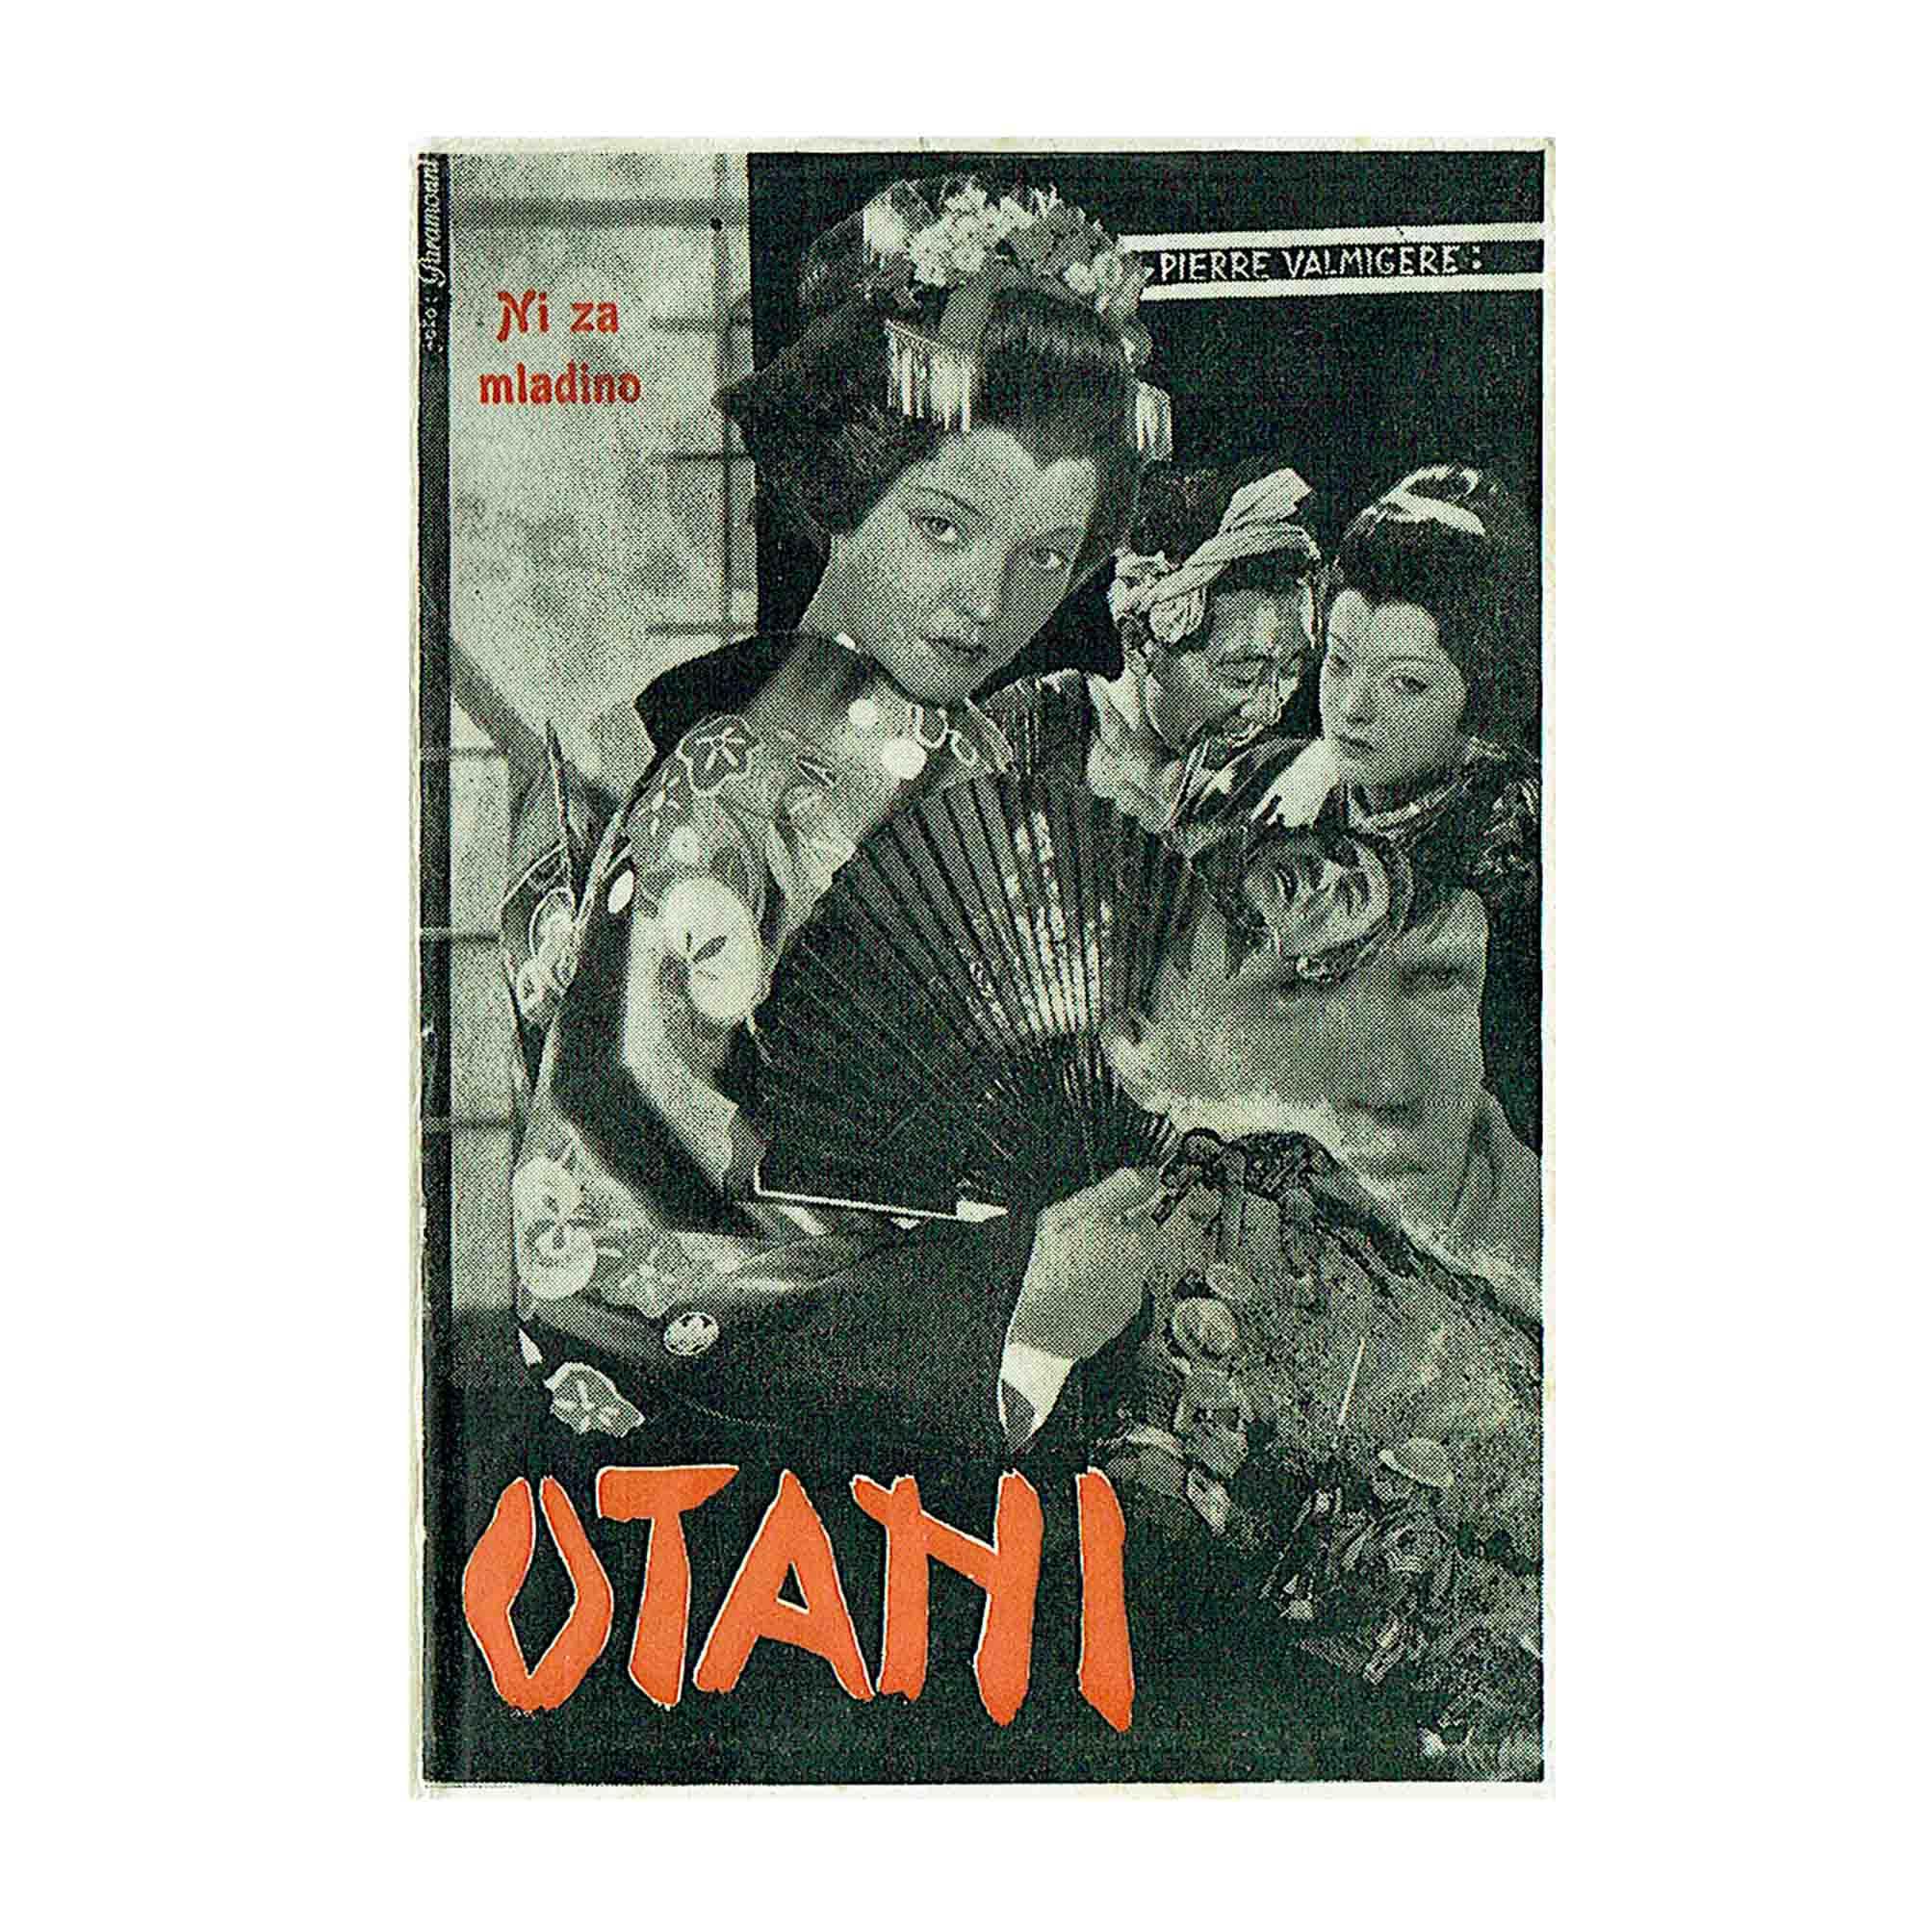 3019-Valmigere-Otani-Slowenisch-Svigelj-Mico-1935-Umschlag-AA-N.jpg